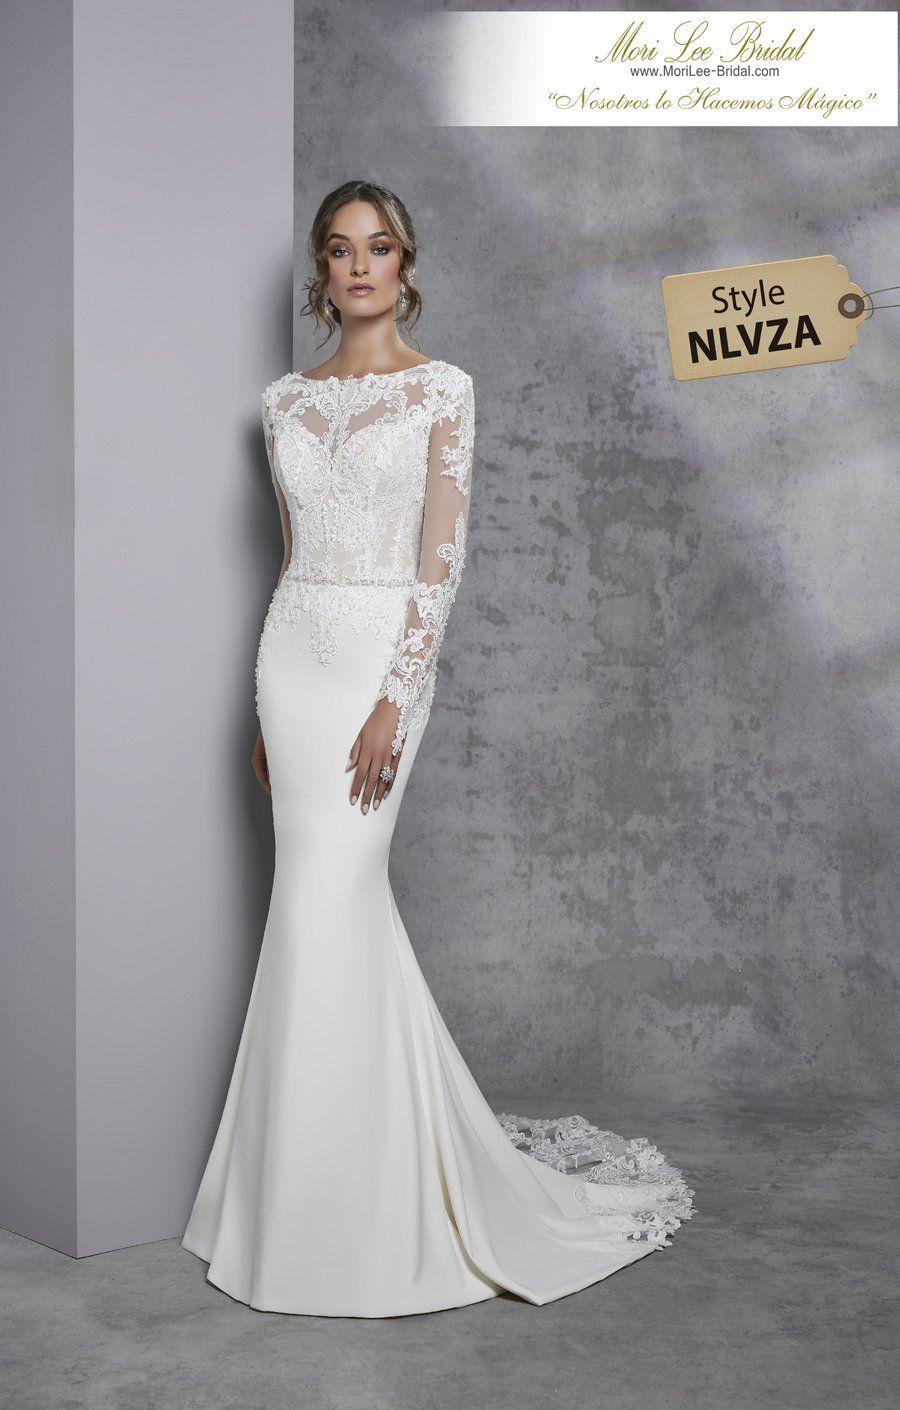 Nlvza Top Wedding Dresses Chic Wedding Dresses Unique Wedding